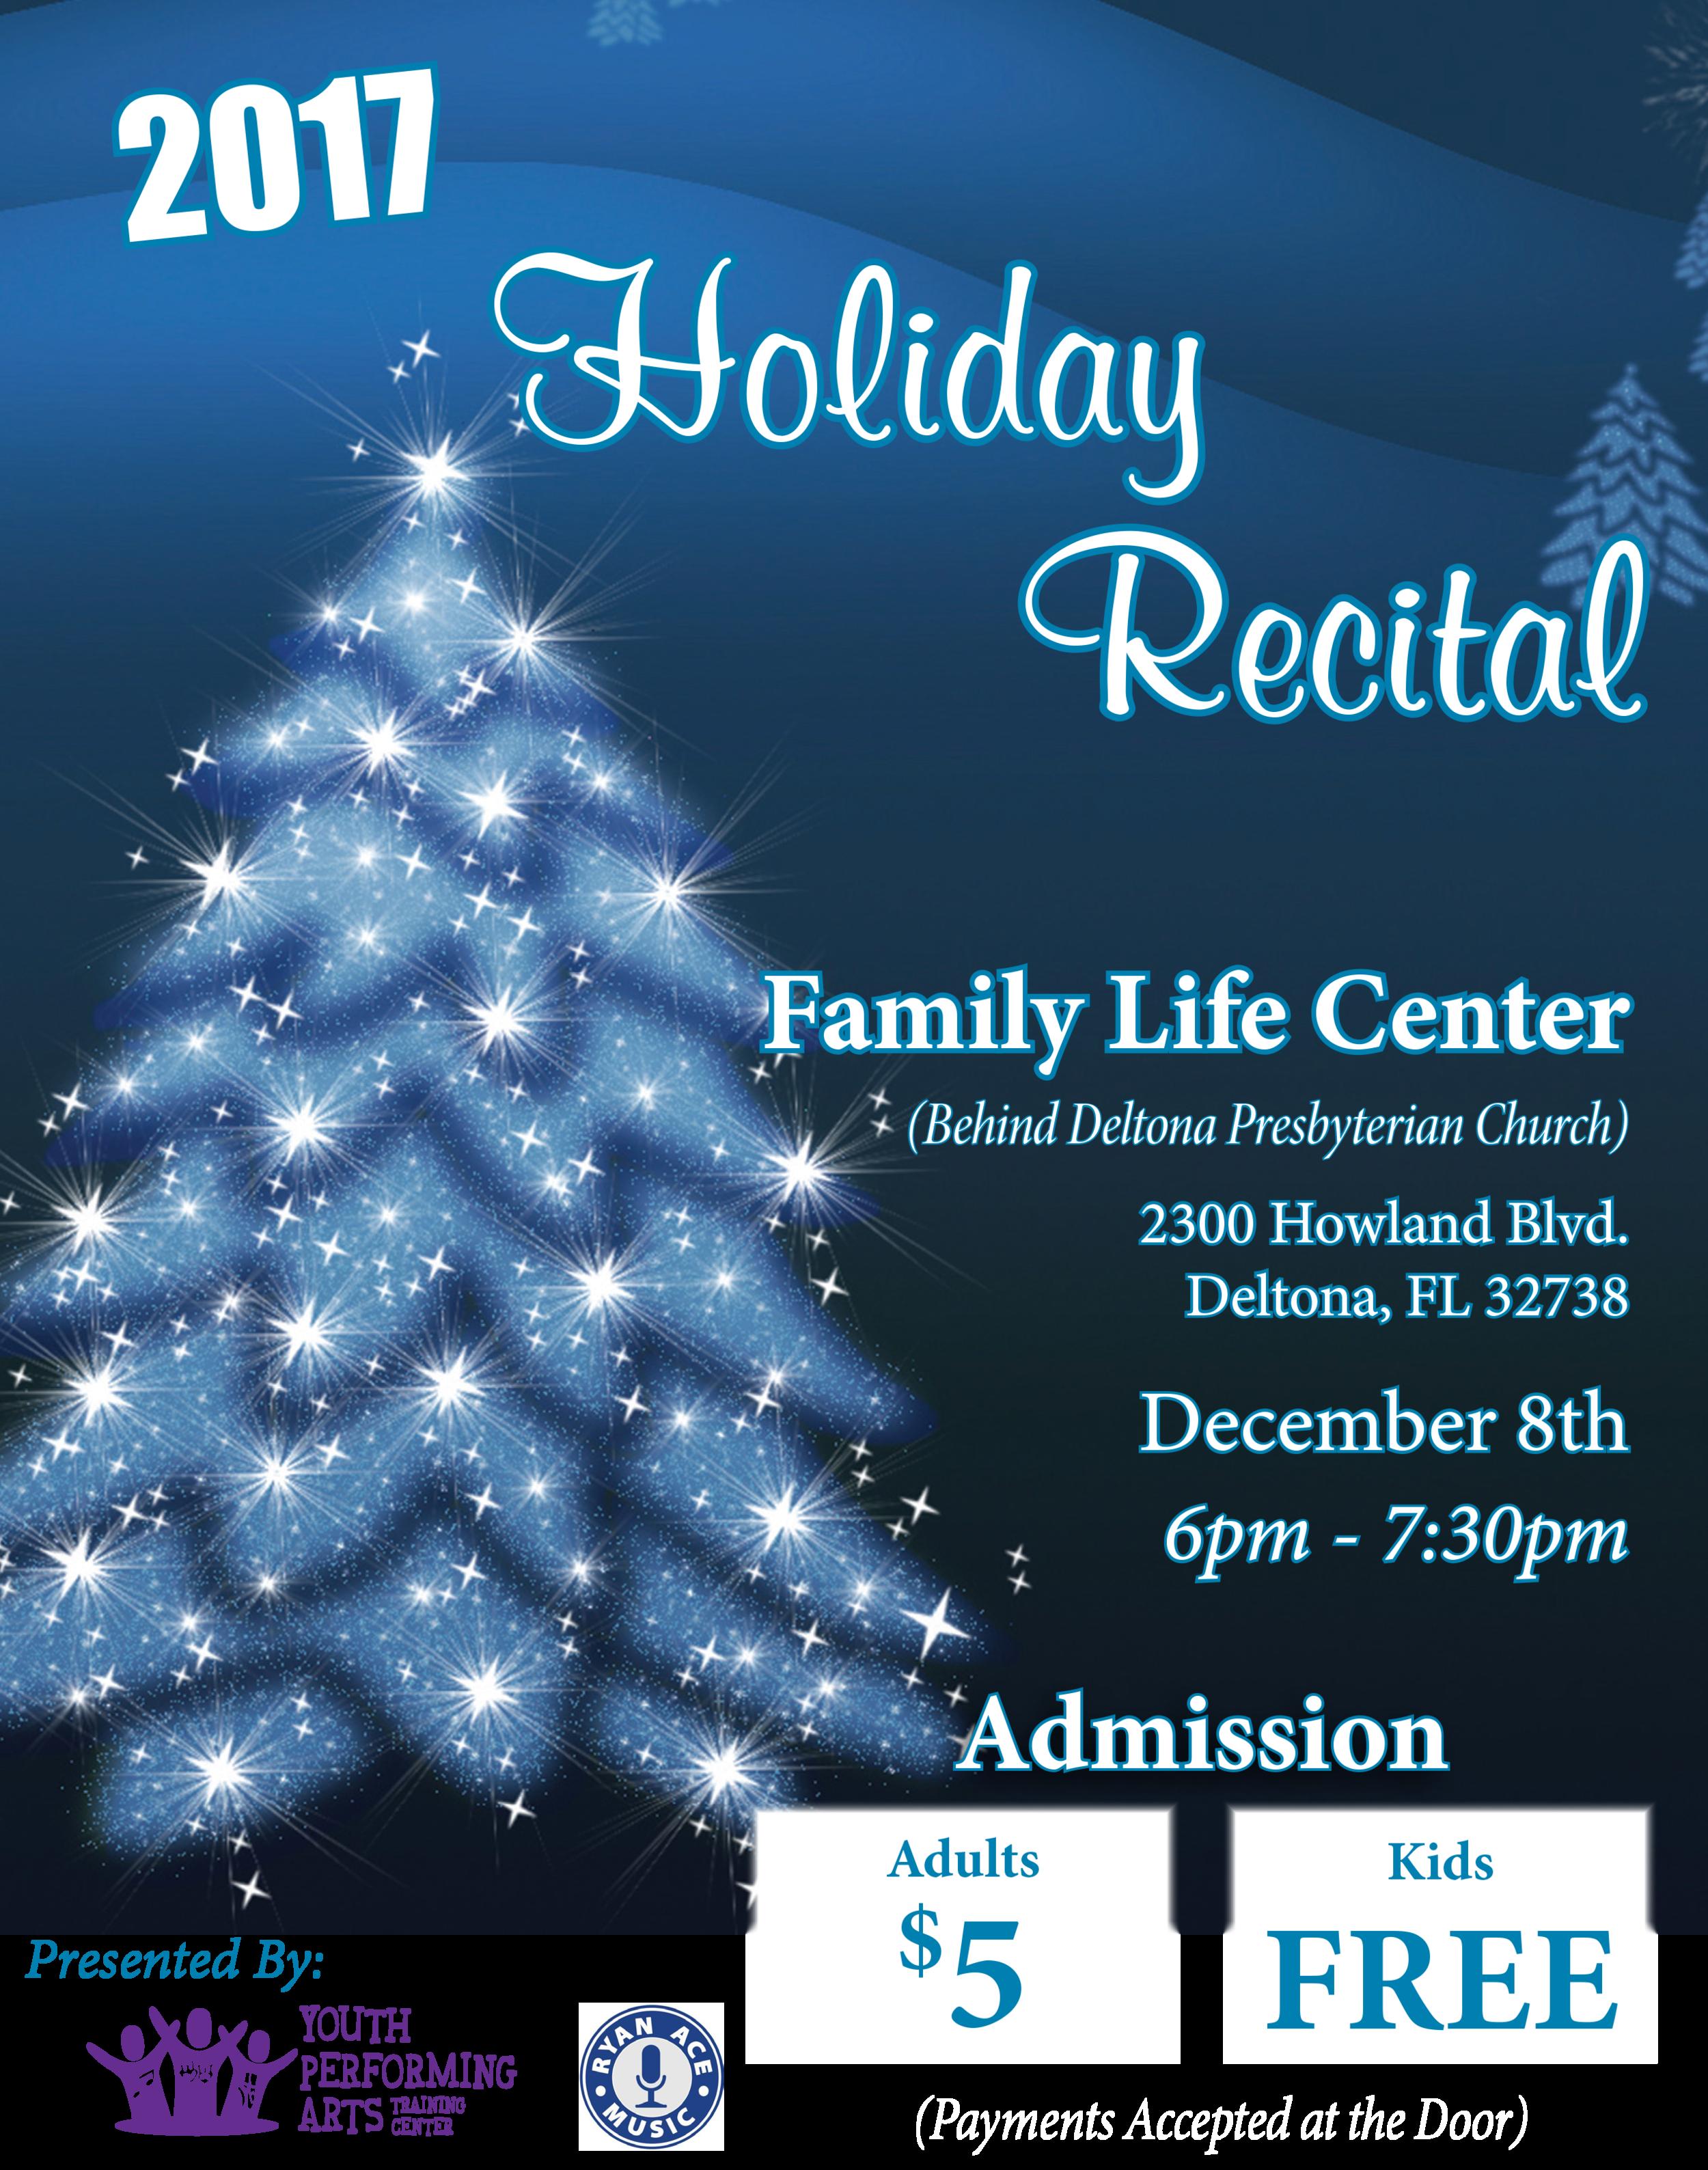 Holiday-Recital-Flyer.png